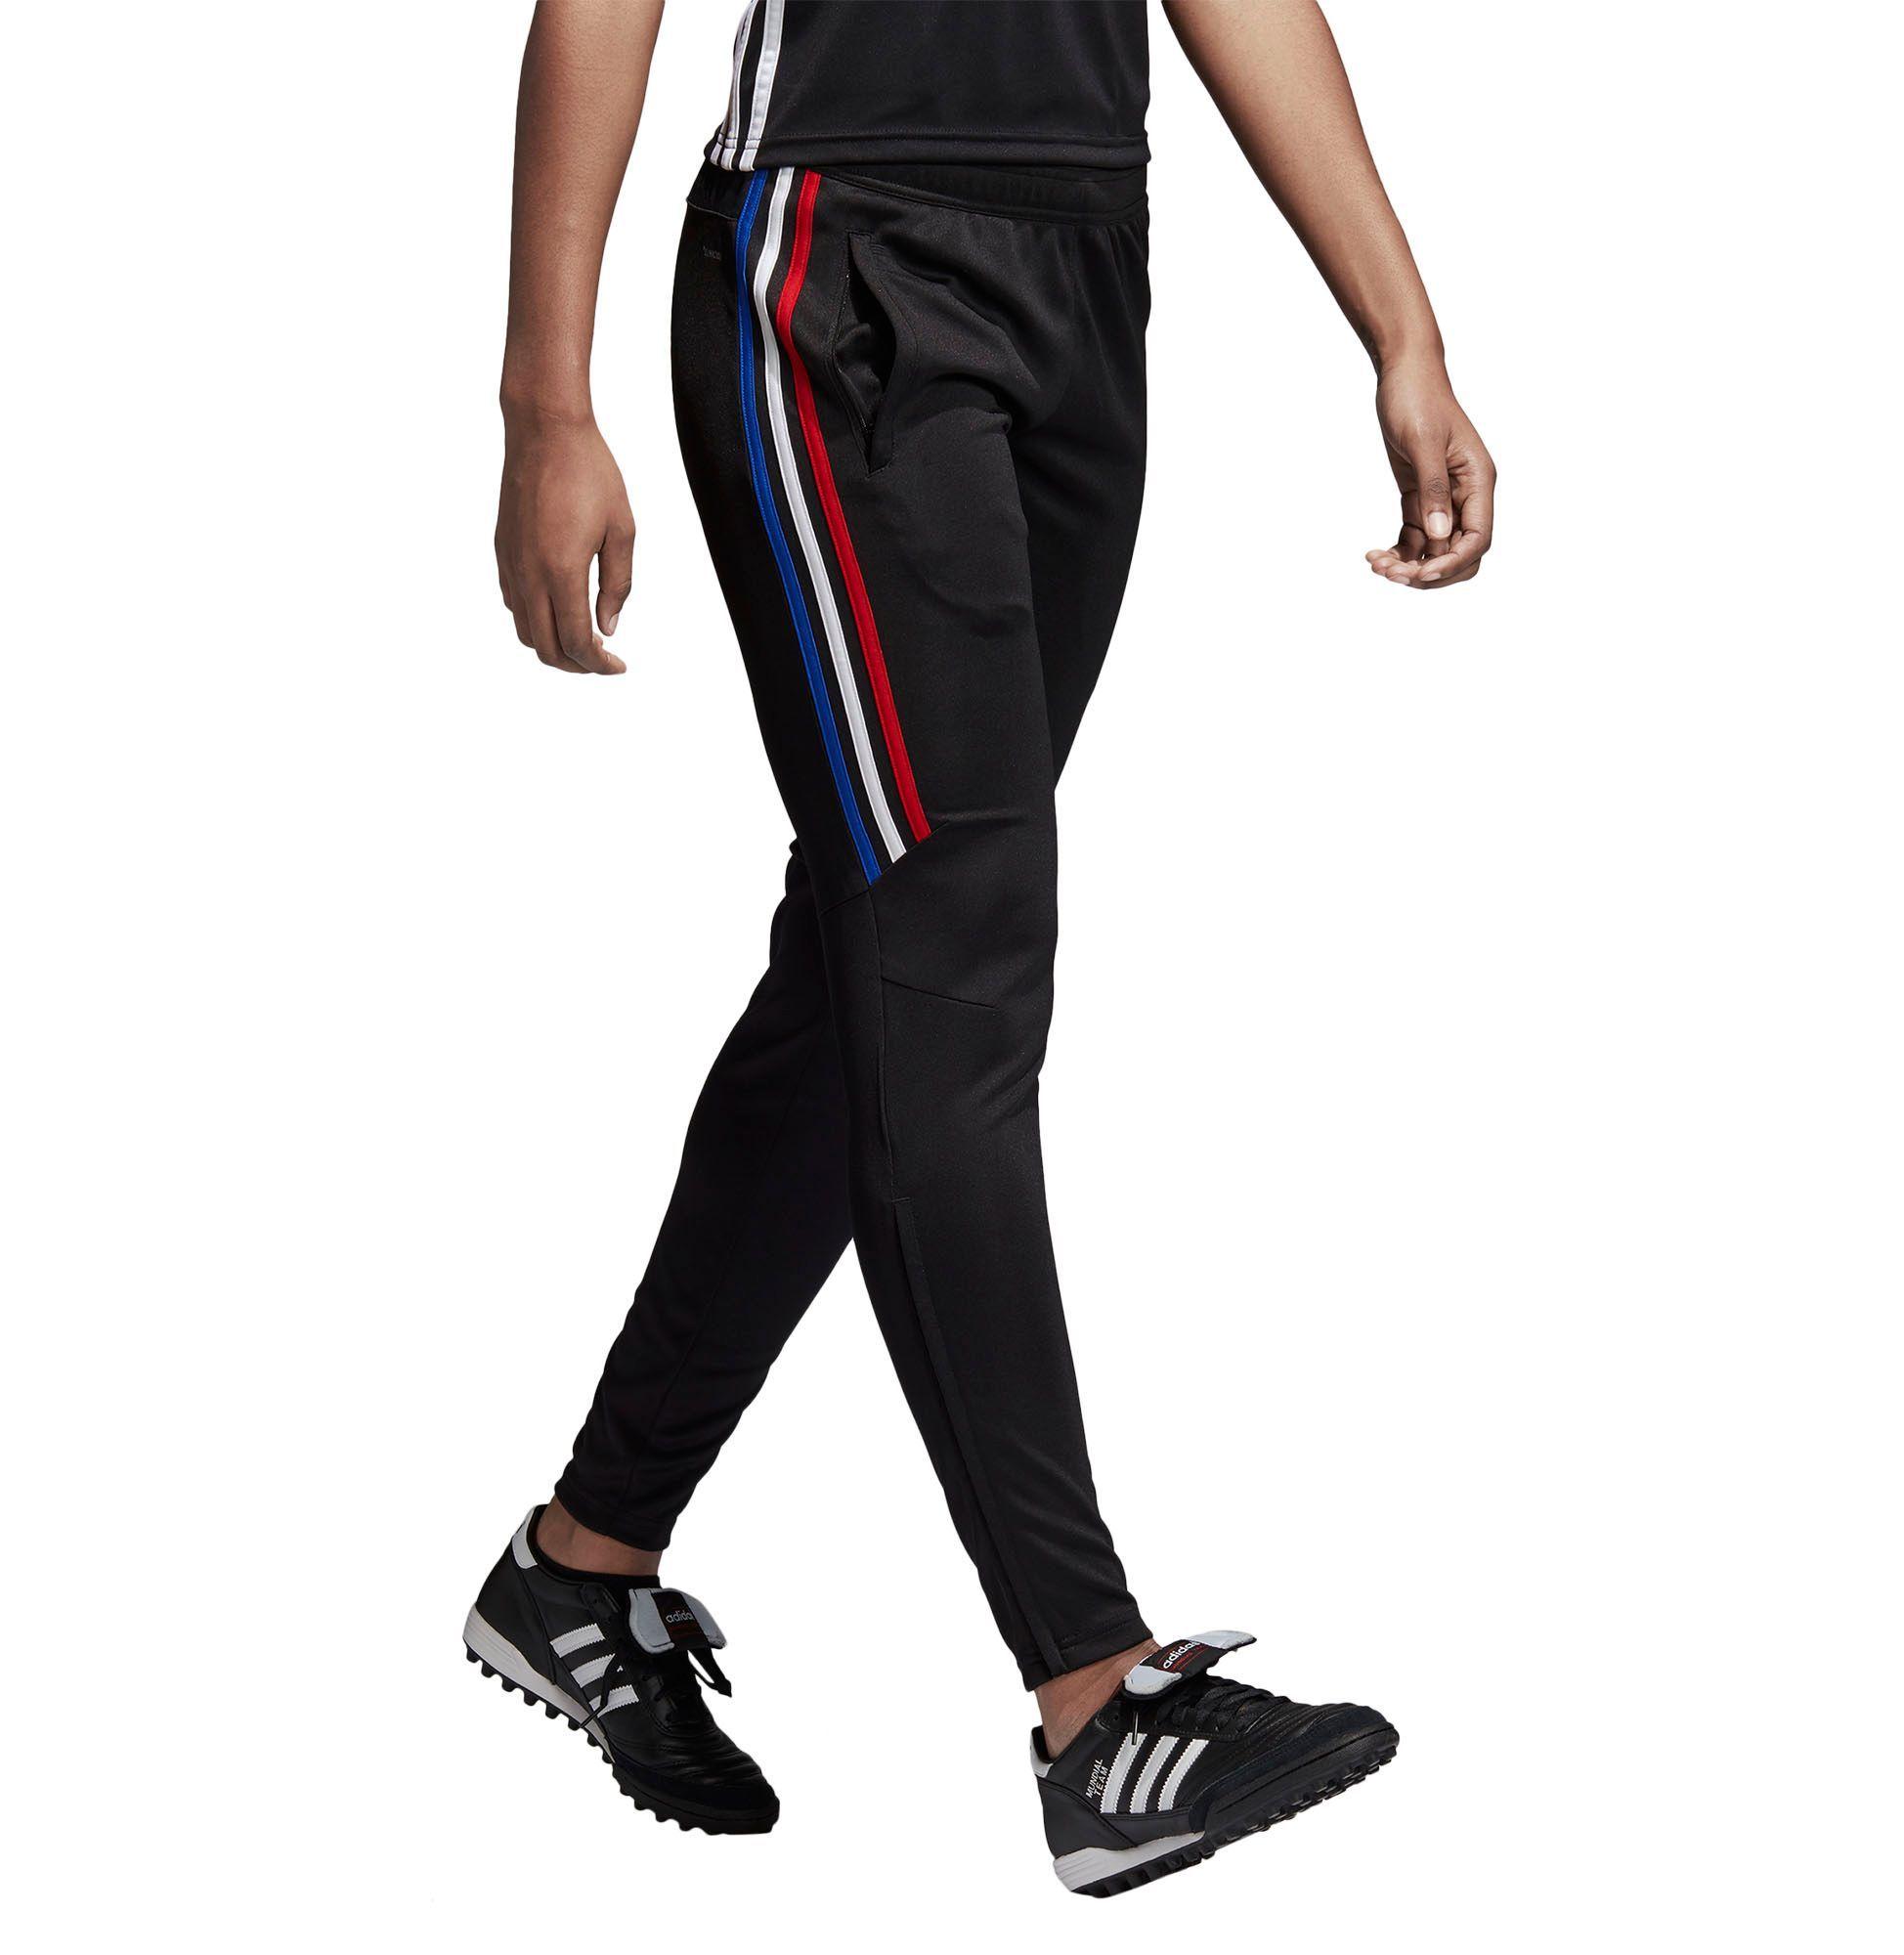 5a2e91ffd2839b adidas Women s Tiro 17 Americana Soccer Training Pants